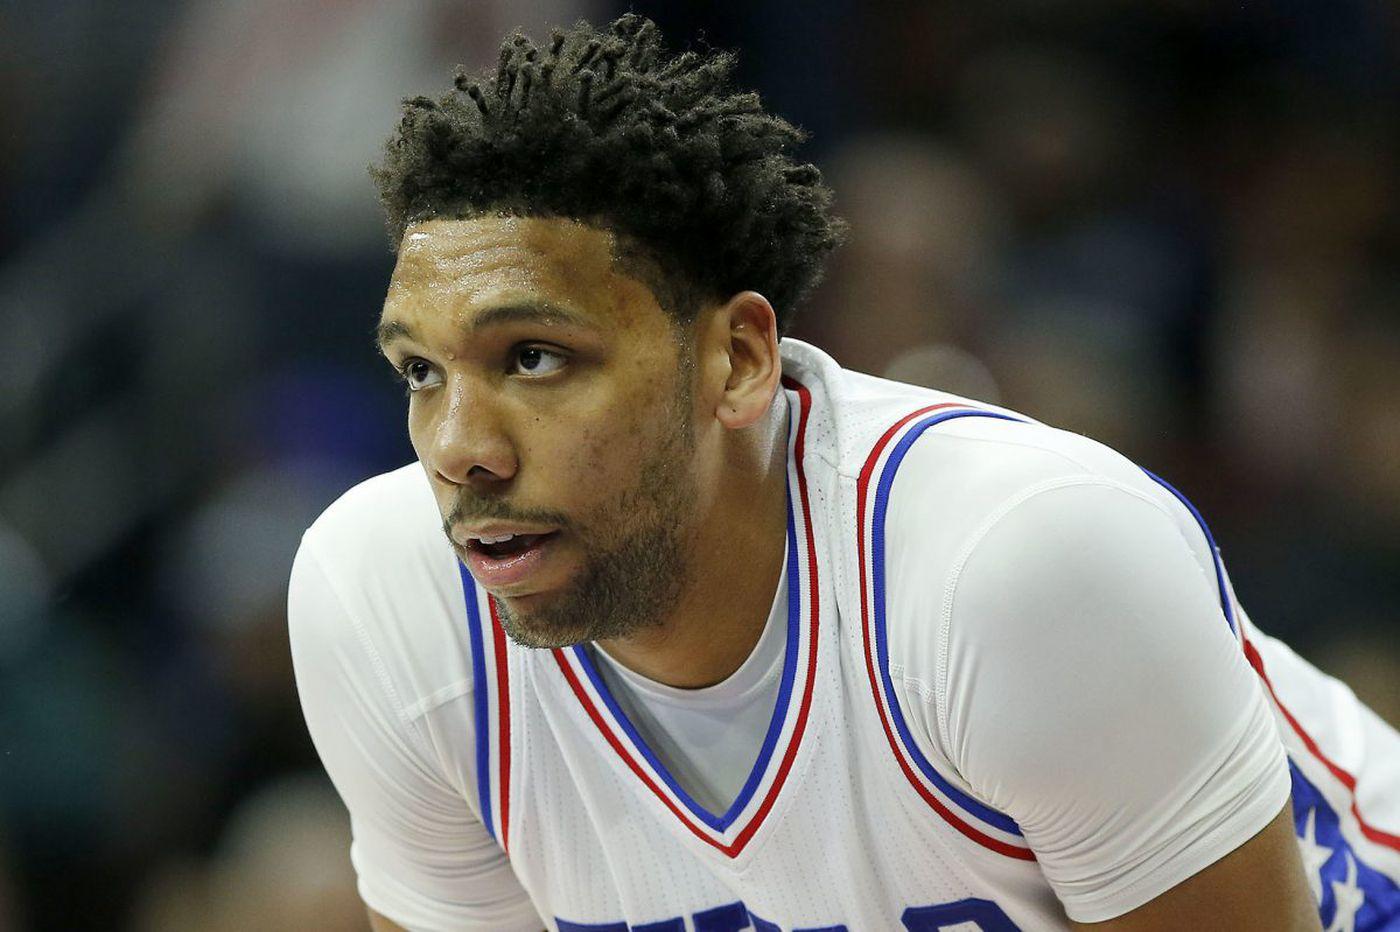 Jahlil Okafor trade: 76ers get Trevor Booker from Brooklyn Nets, also give up Nik Stauskas